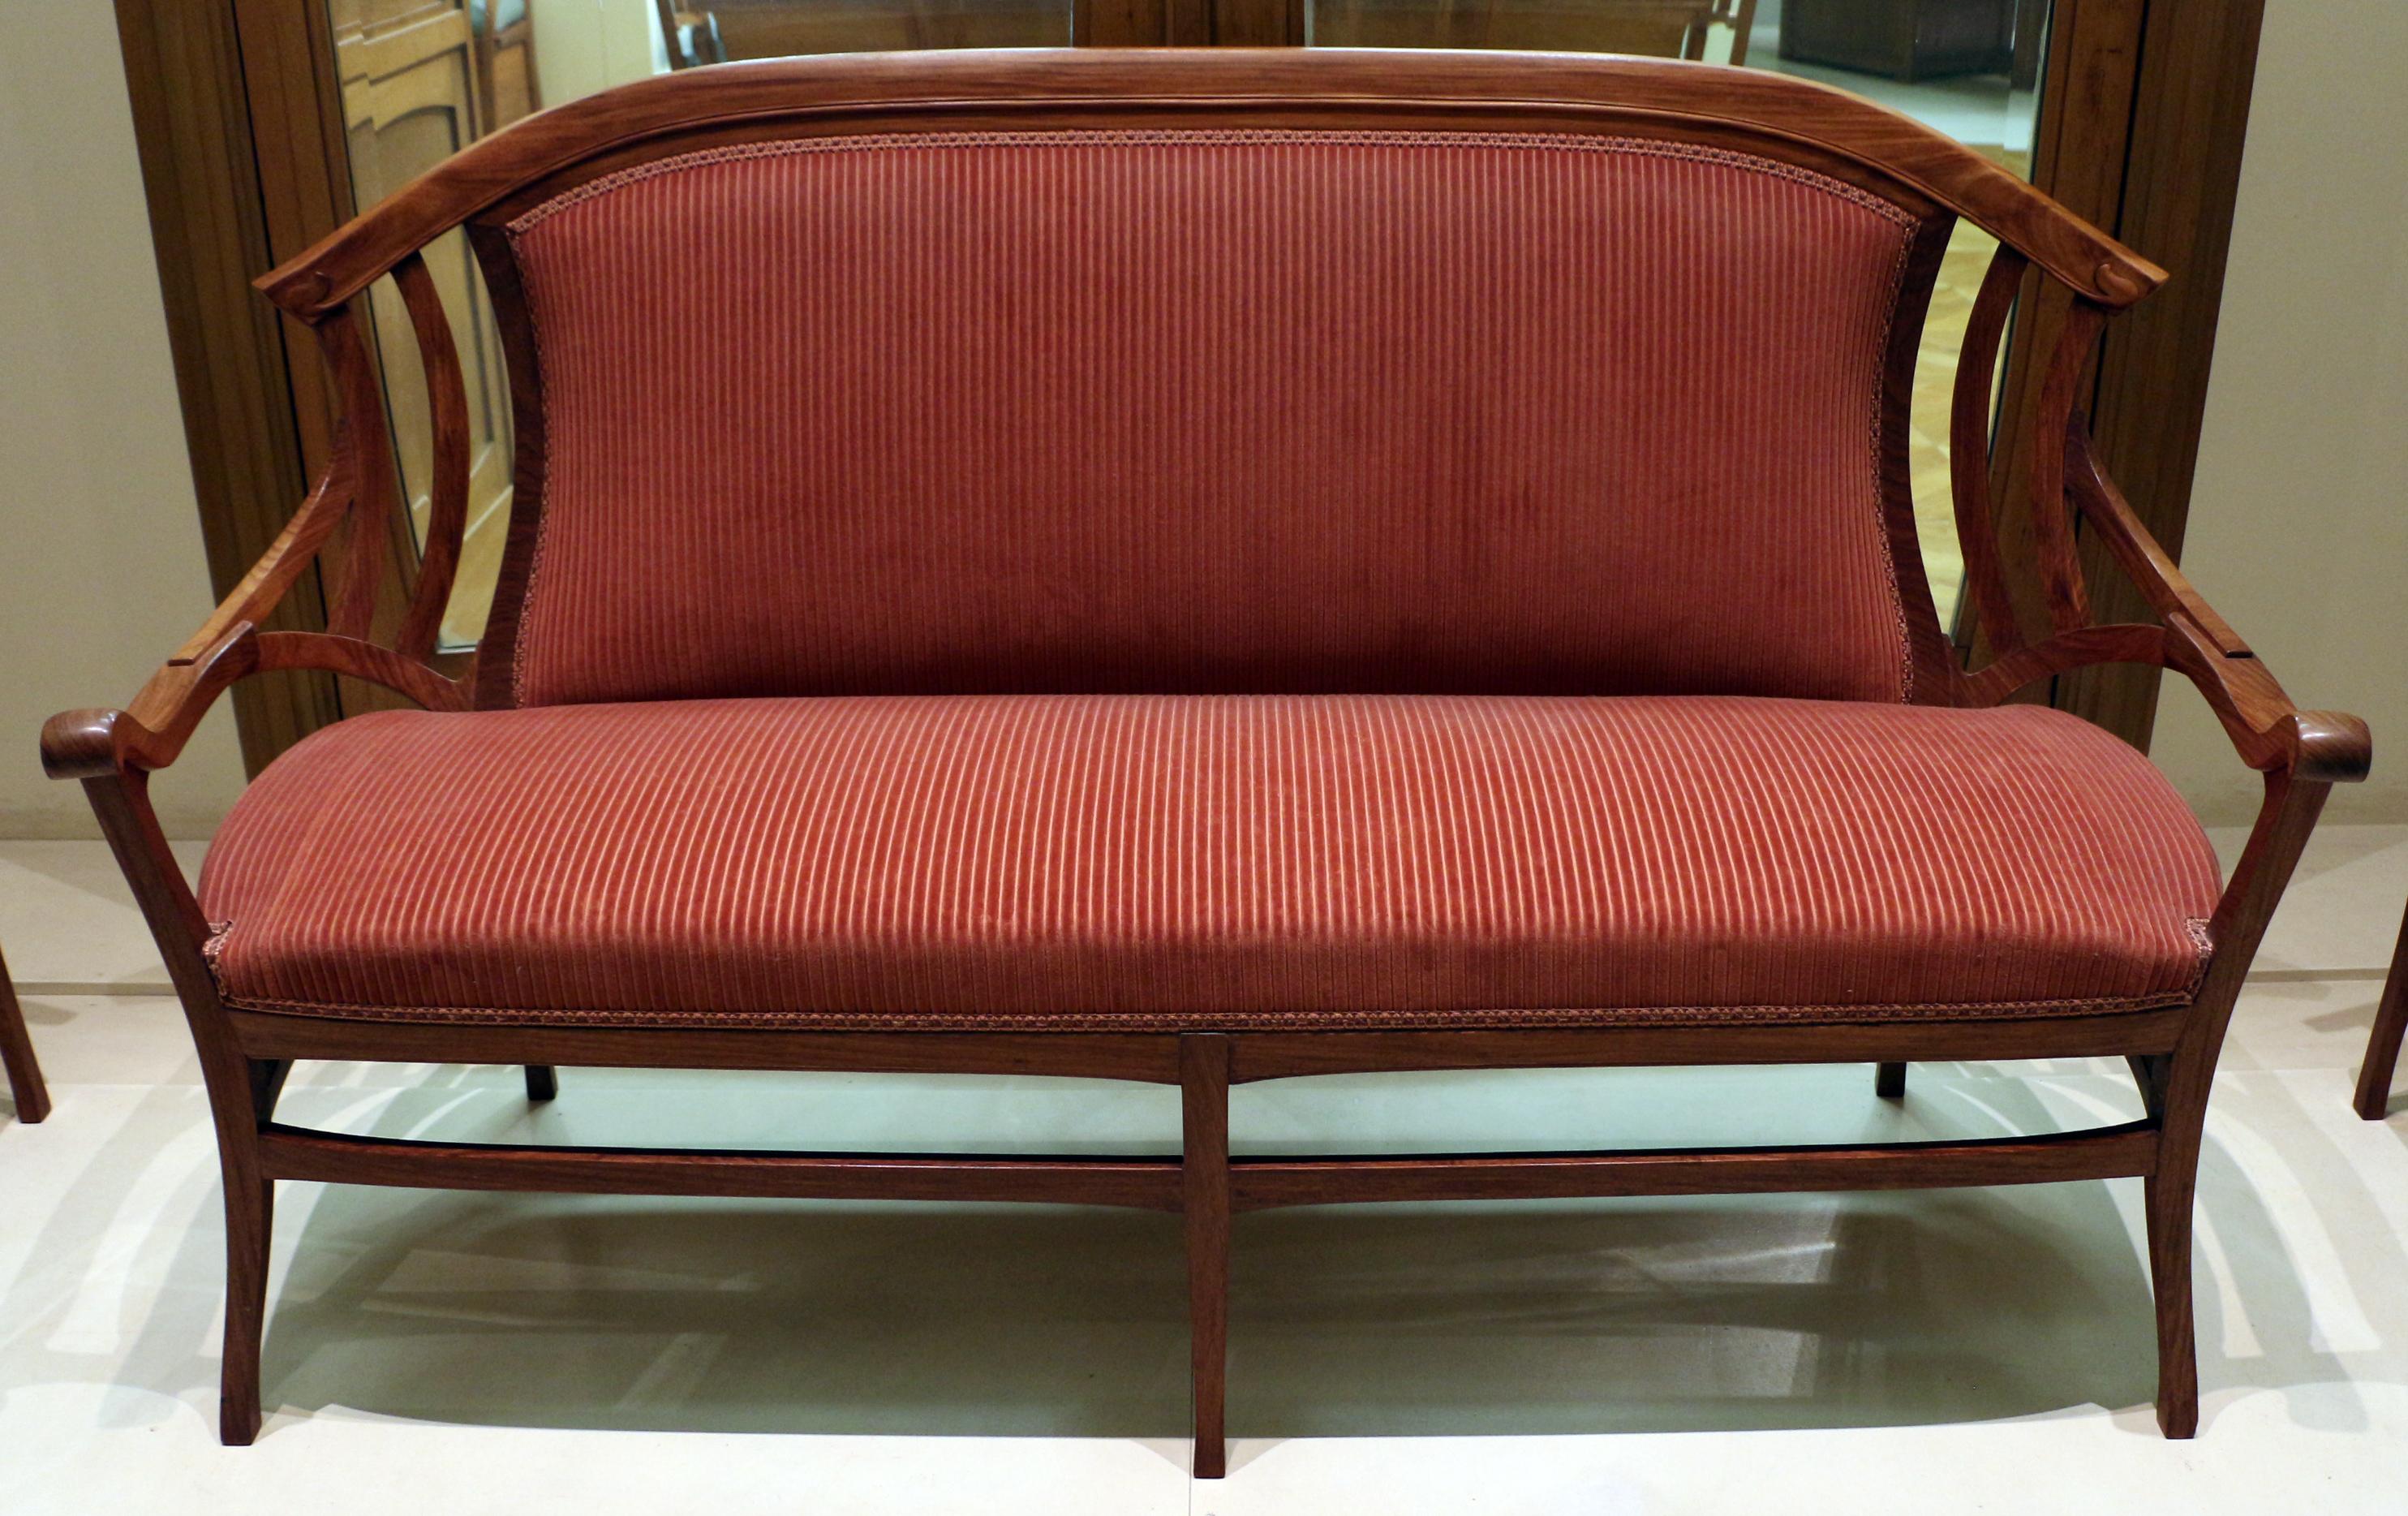 Sedili Wc Ikea : Sedie doccia sedili per doccia sedile disabile ribaltabile